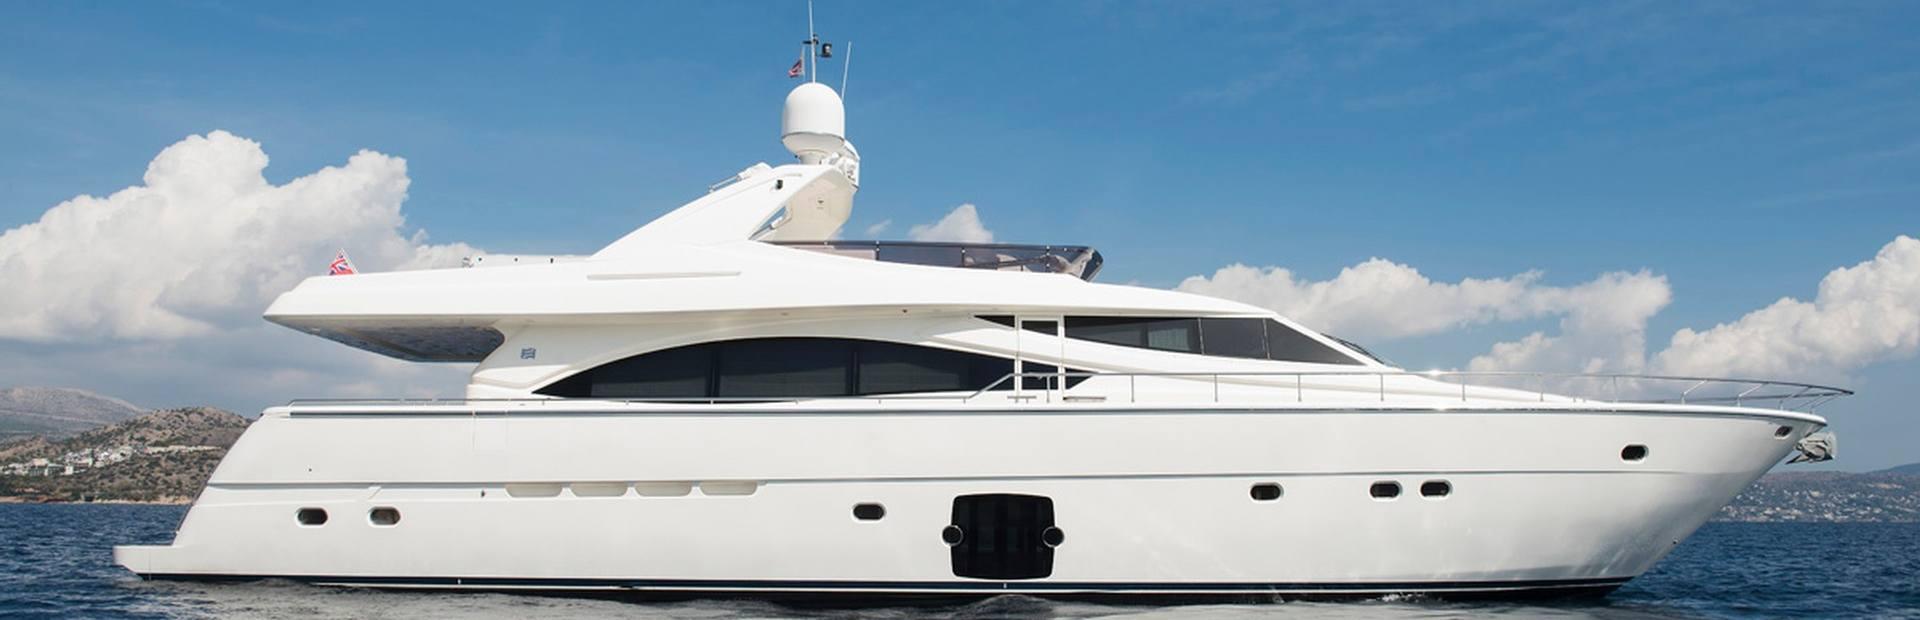 Ferretti Yachts 830 Yacht Charter